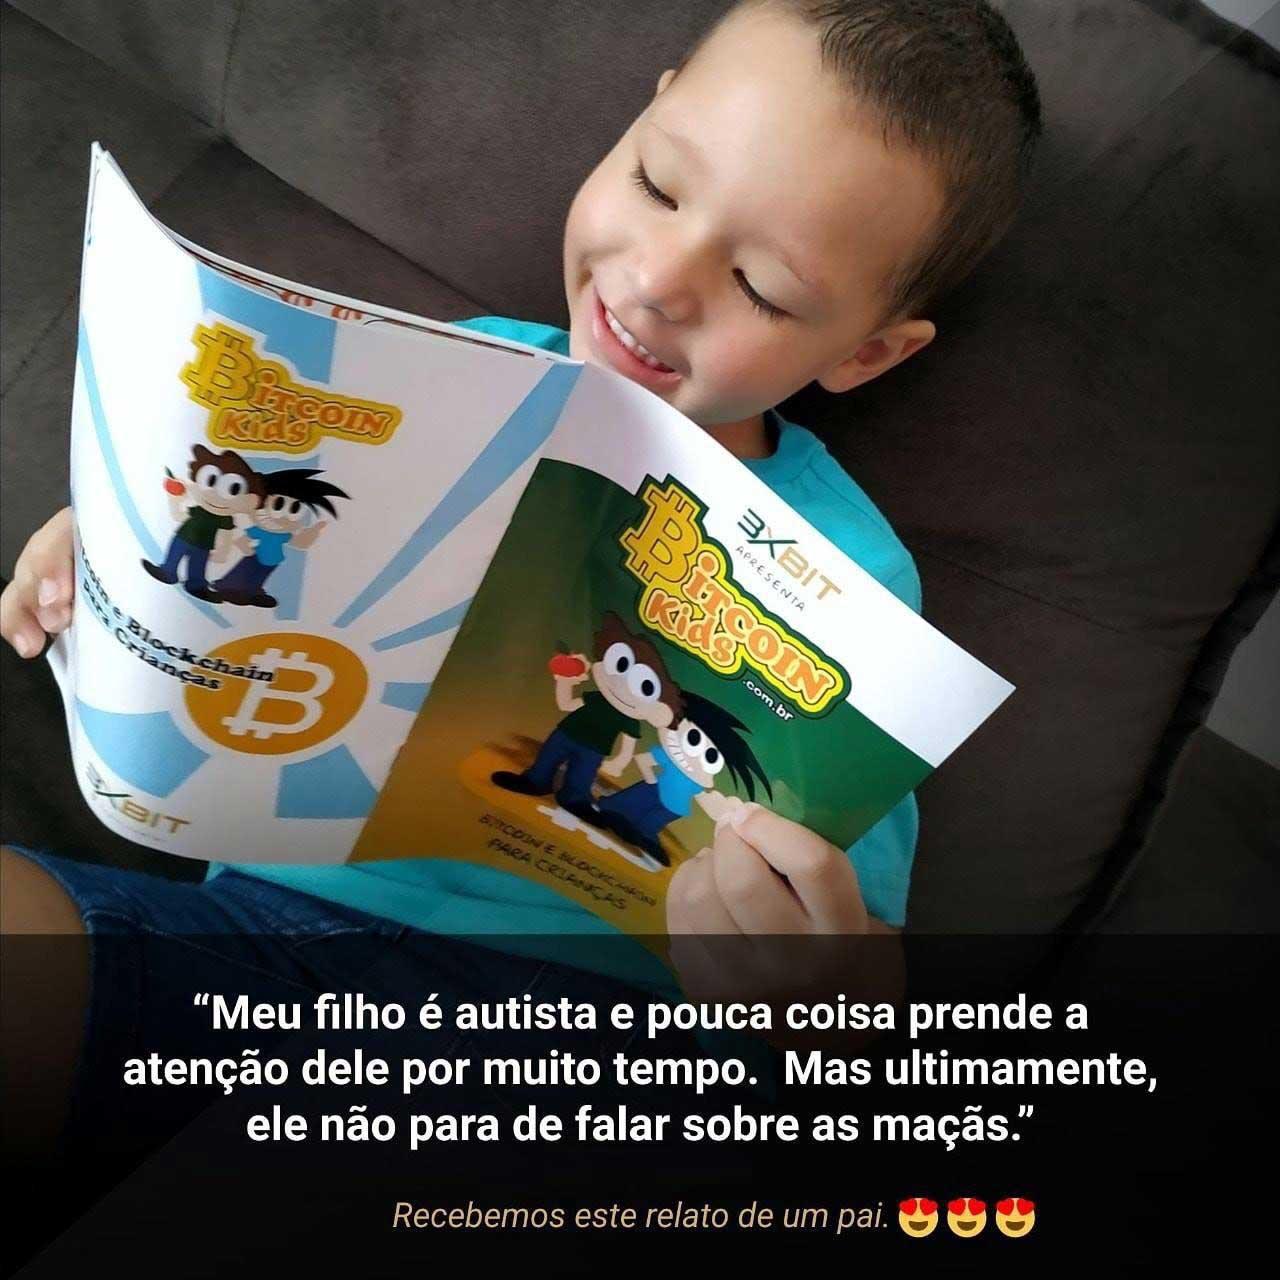 Webitcoin: Bitcoin Kids: iniciativa educacional da 3xbit rompe barreiras